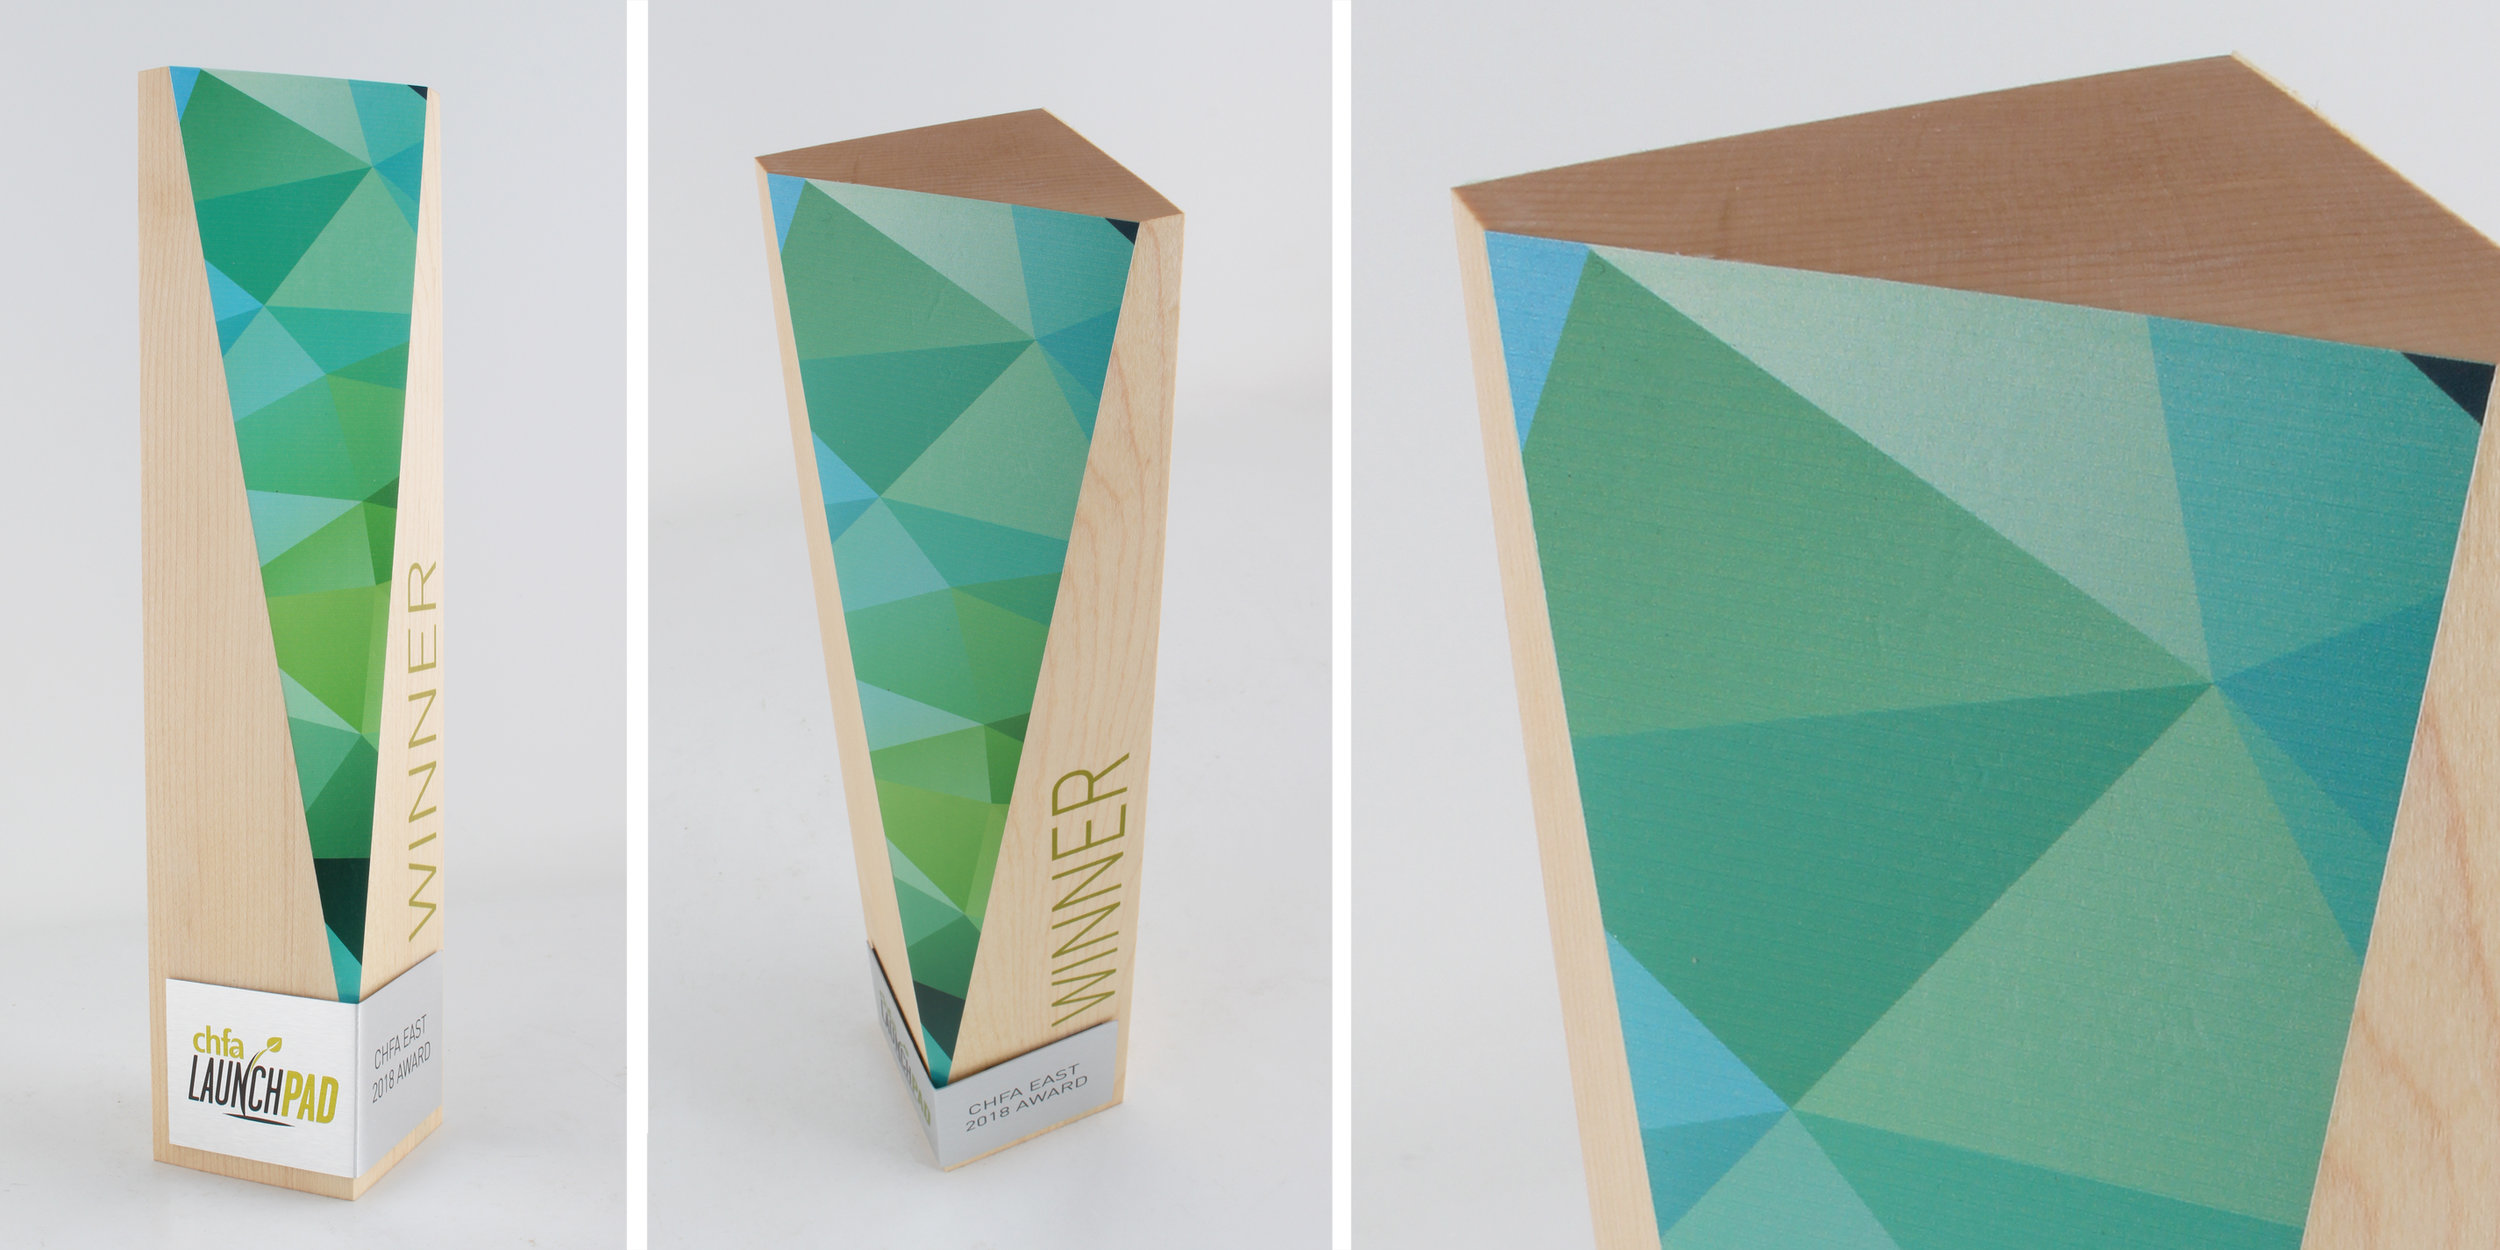 slice-custom-trophy-deal-toy-financial-tombstone-6.jpg